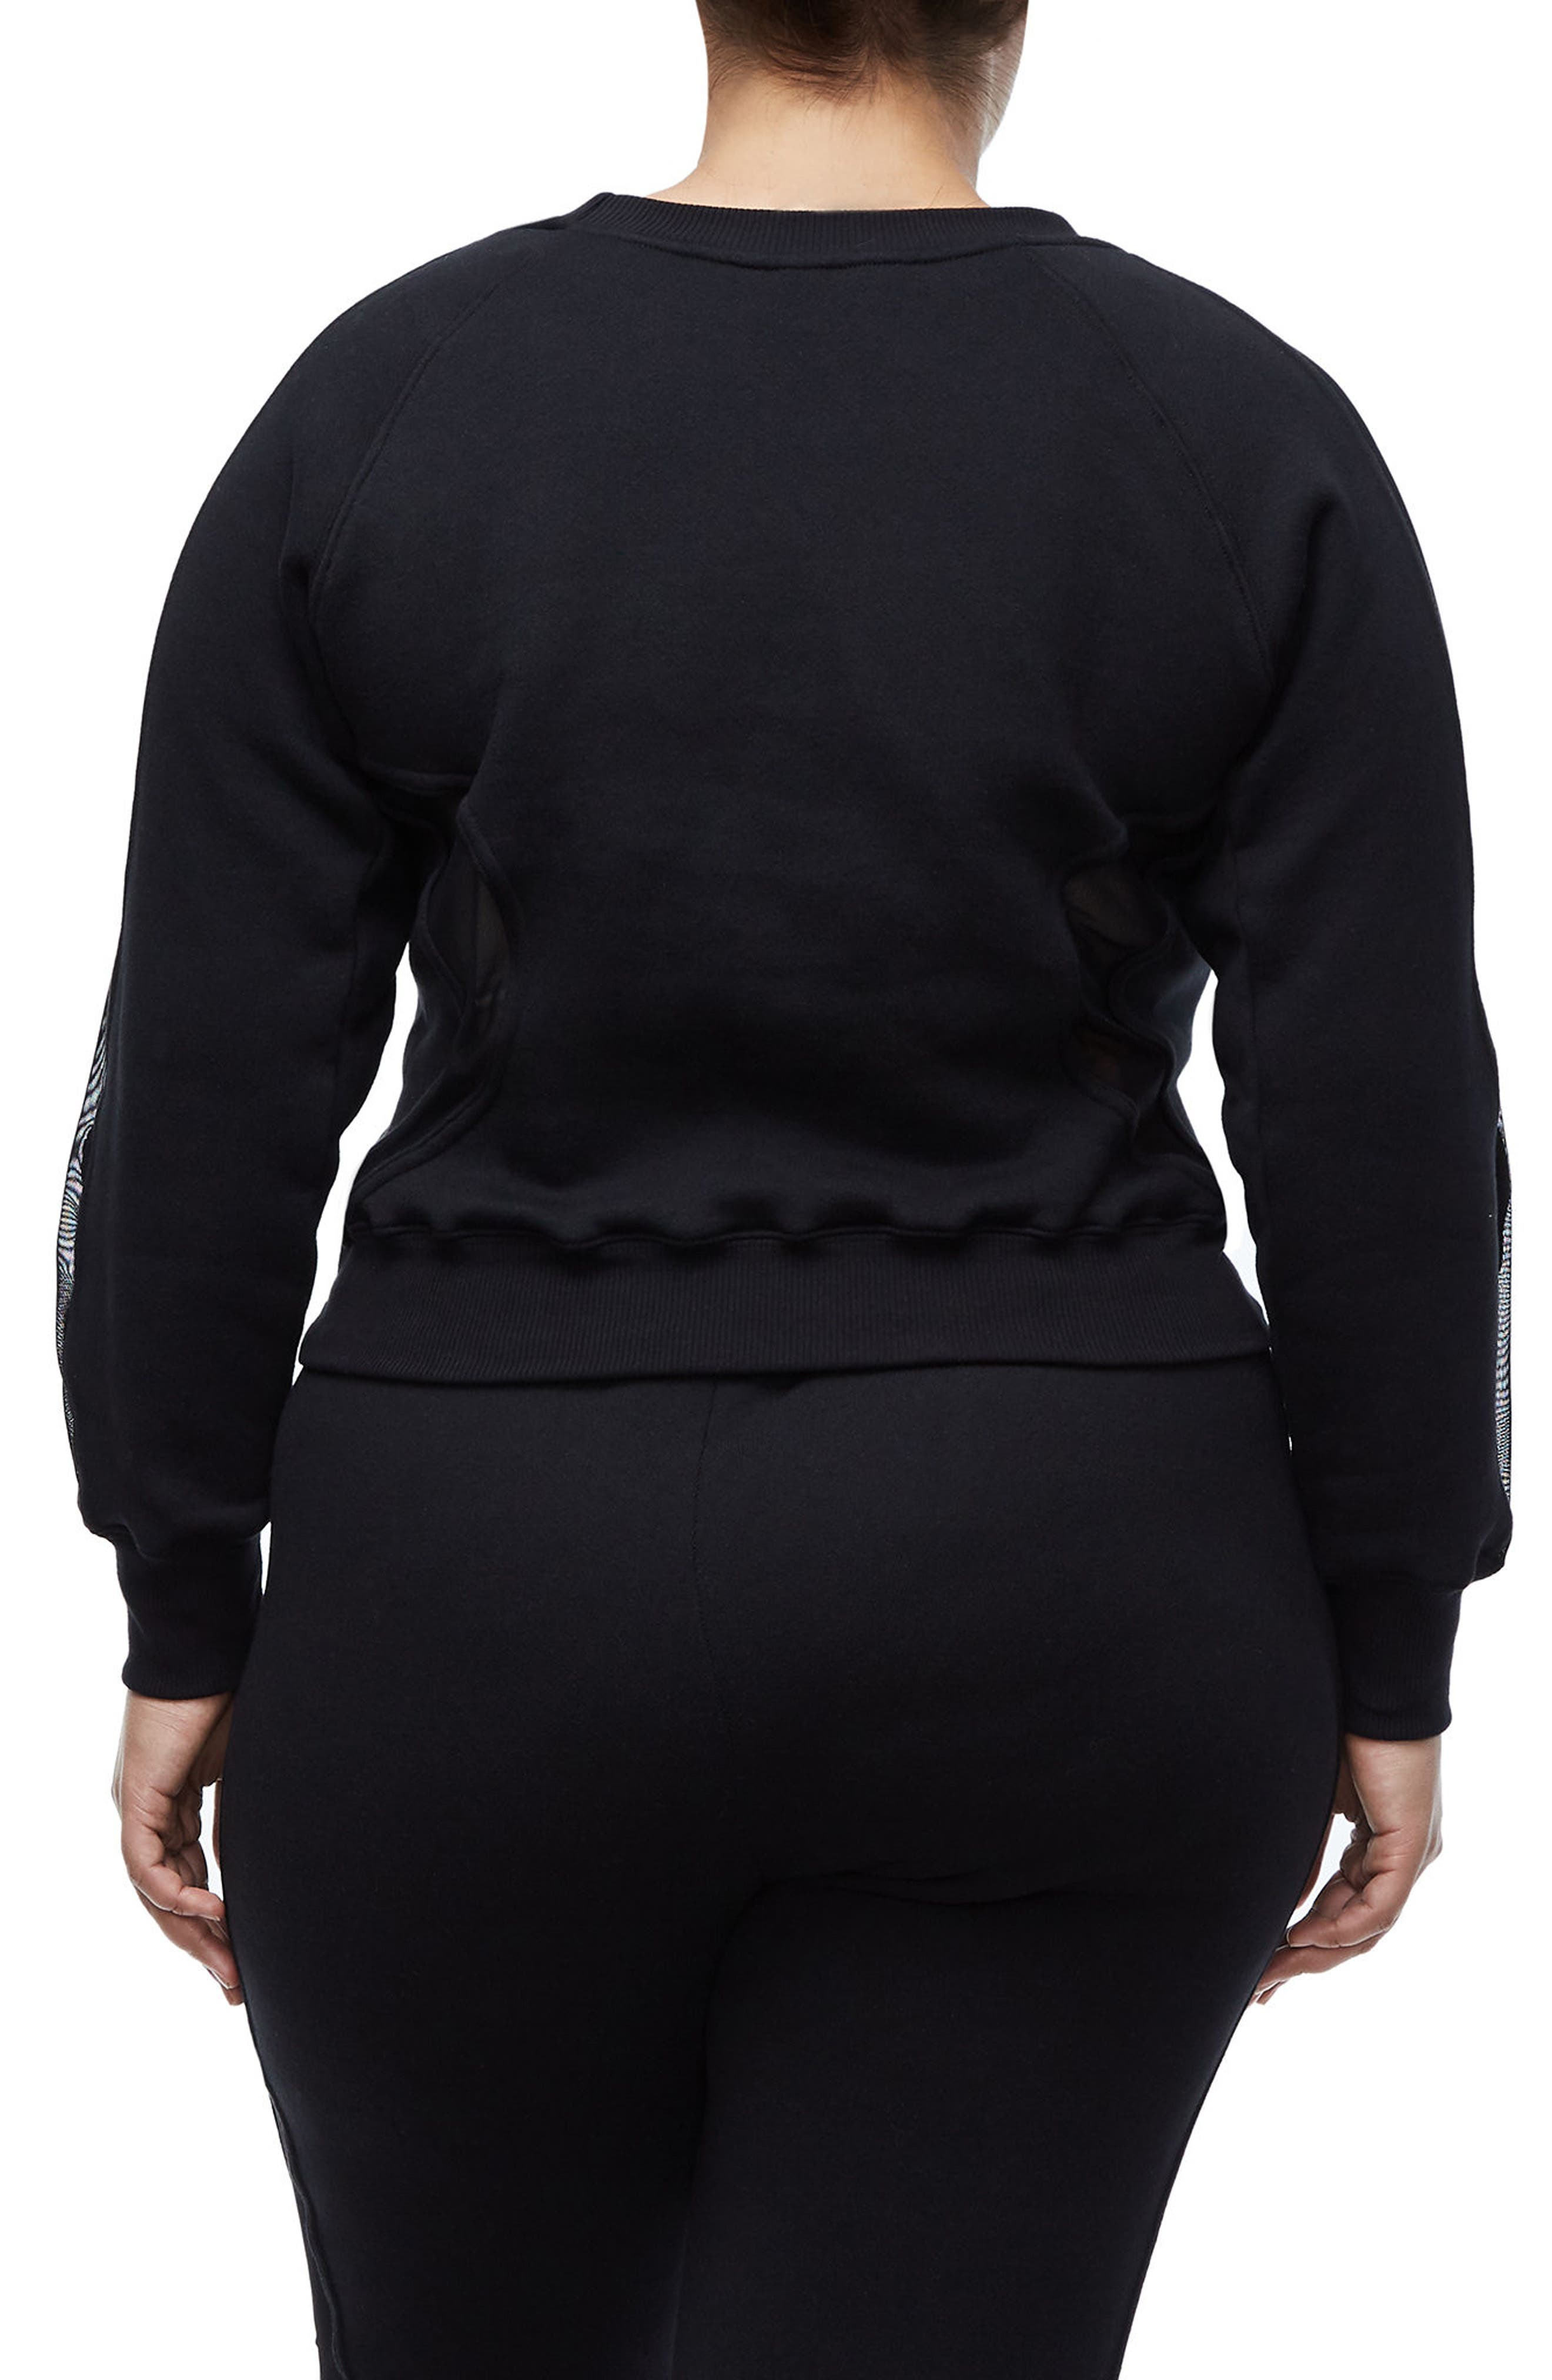 Good Sweats Mesh Inset Sweatshirt,                             Alternate thumbnail 4, color,                             Good Black